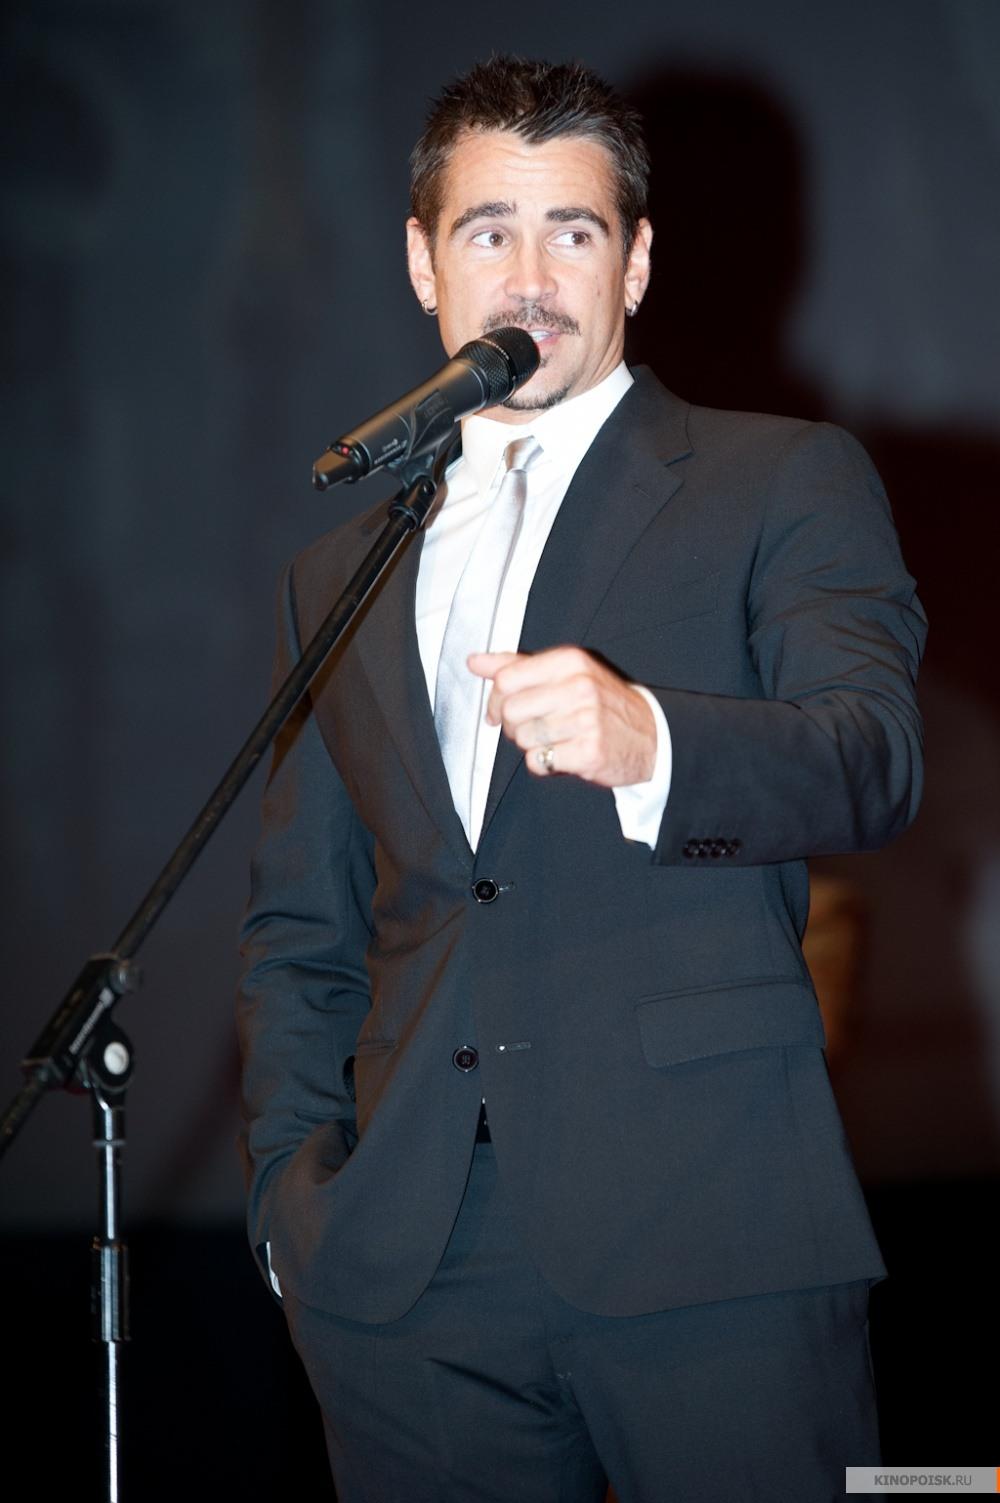 http://st.kinopoisk.ru/im/events/1/9/4/kinopoisk.ru--1943976--n--1943976_20120809044115225888.jpg